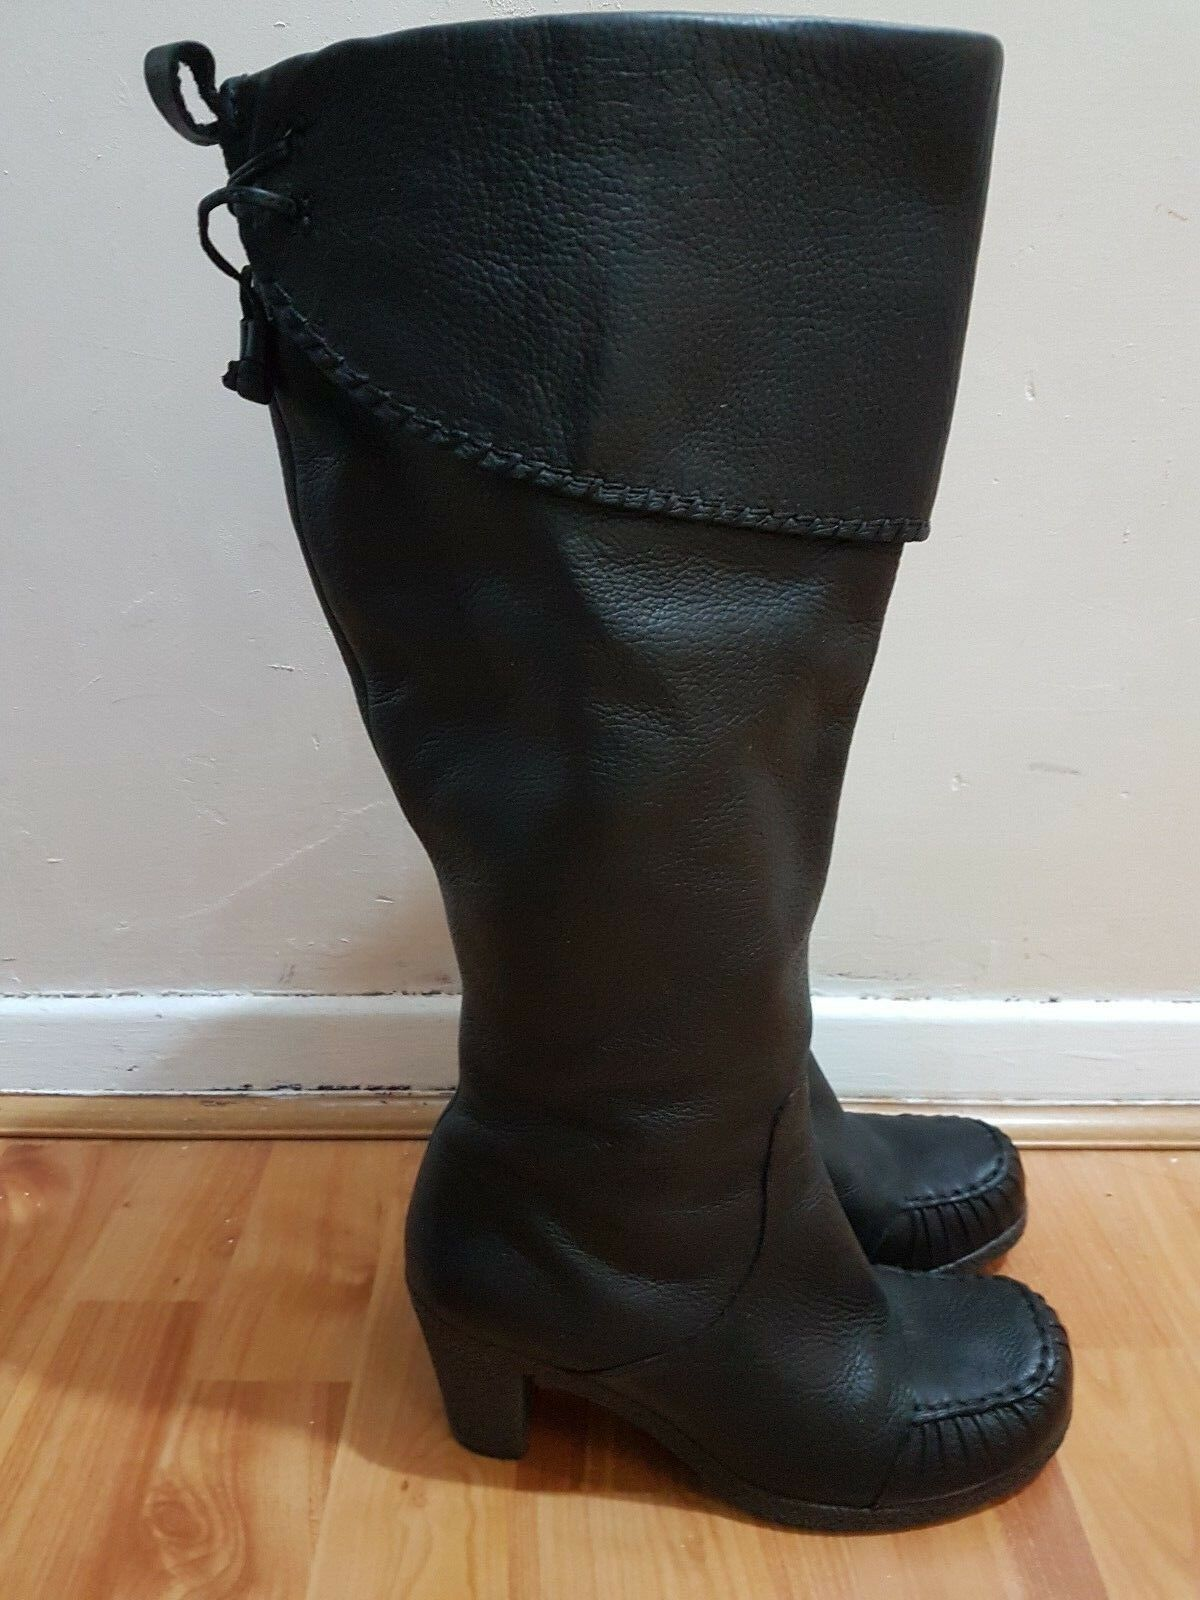 Clarks noir bottes Mid height UK 5